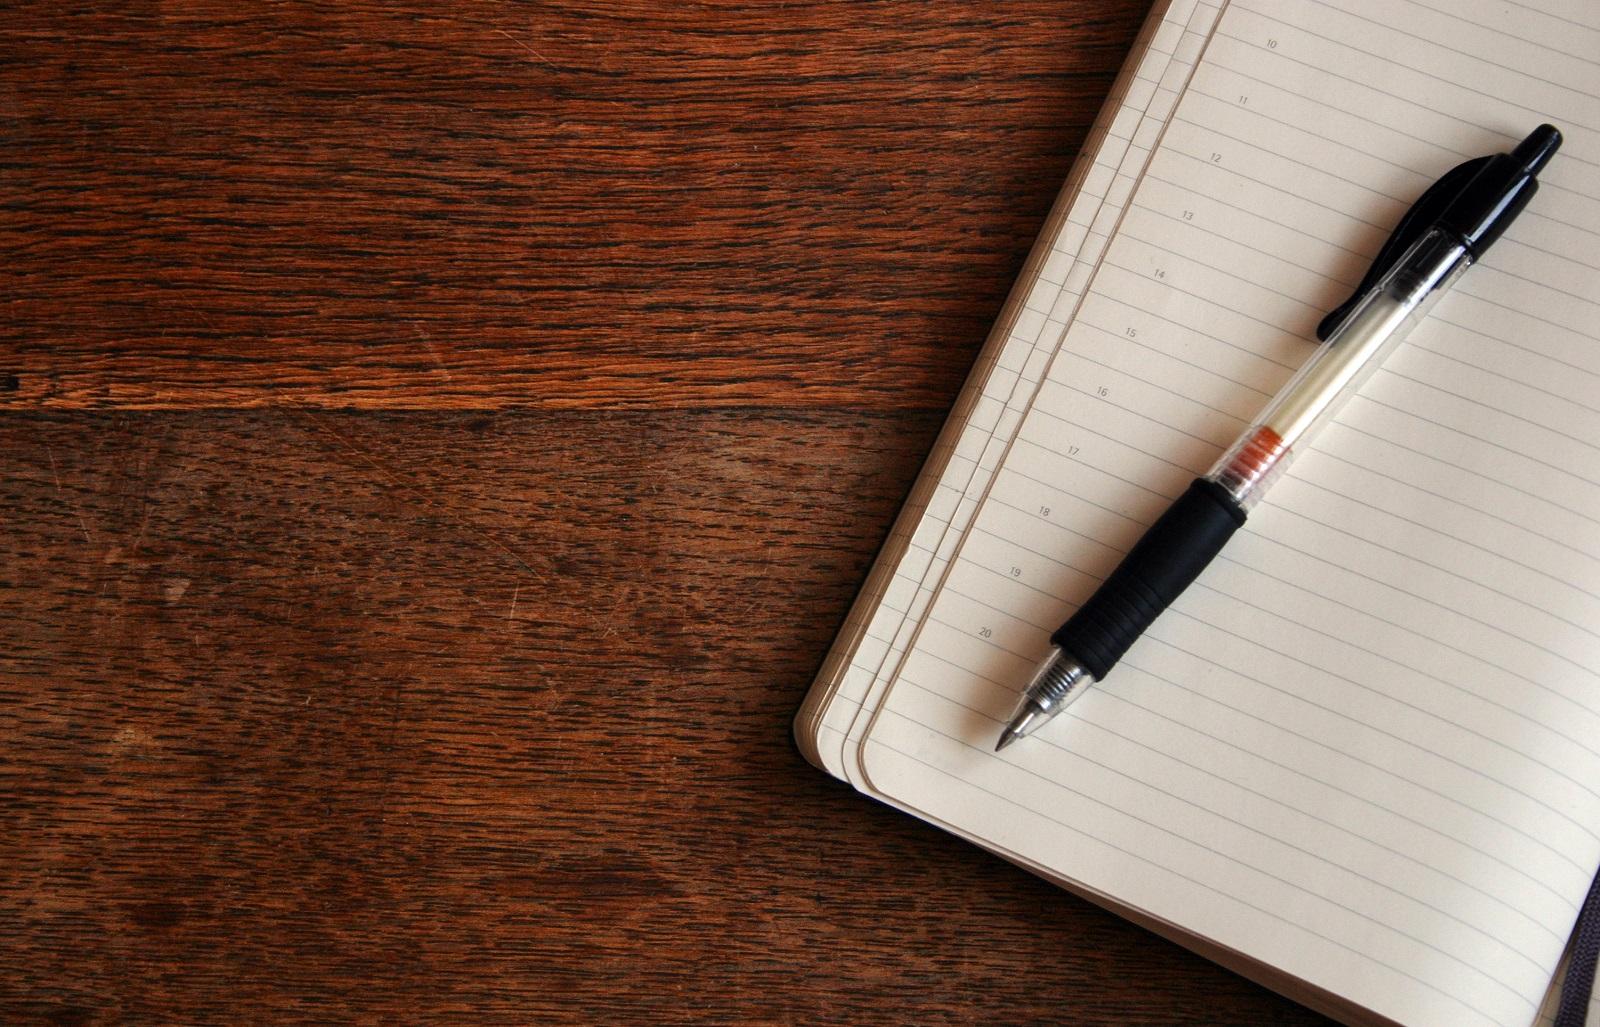 Blogging, Instant Gratification and Perserverance